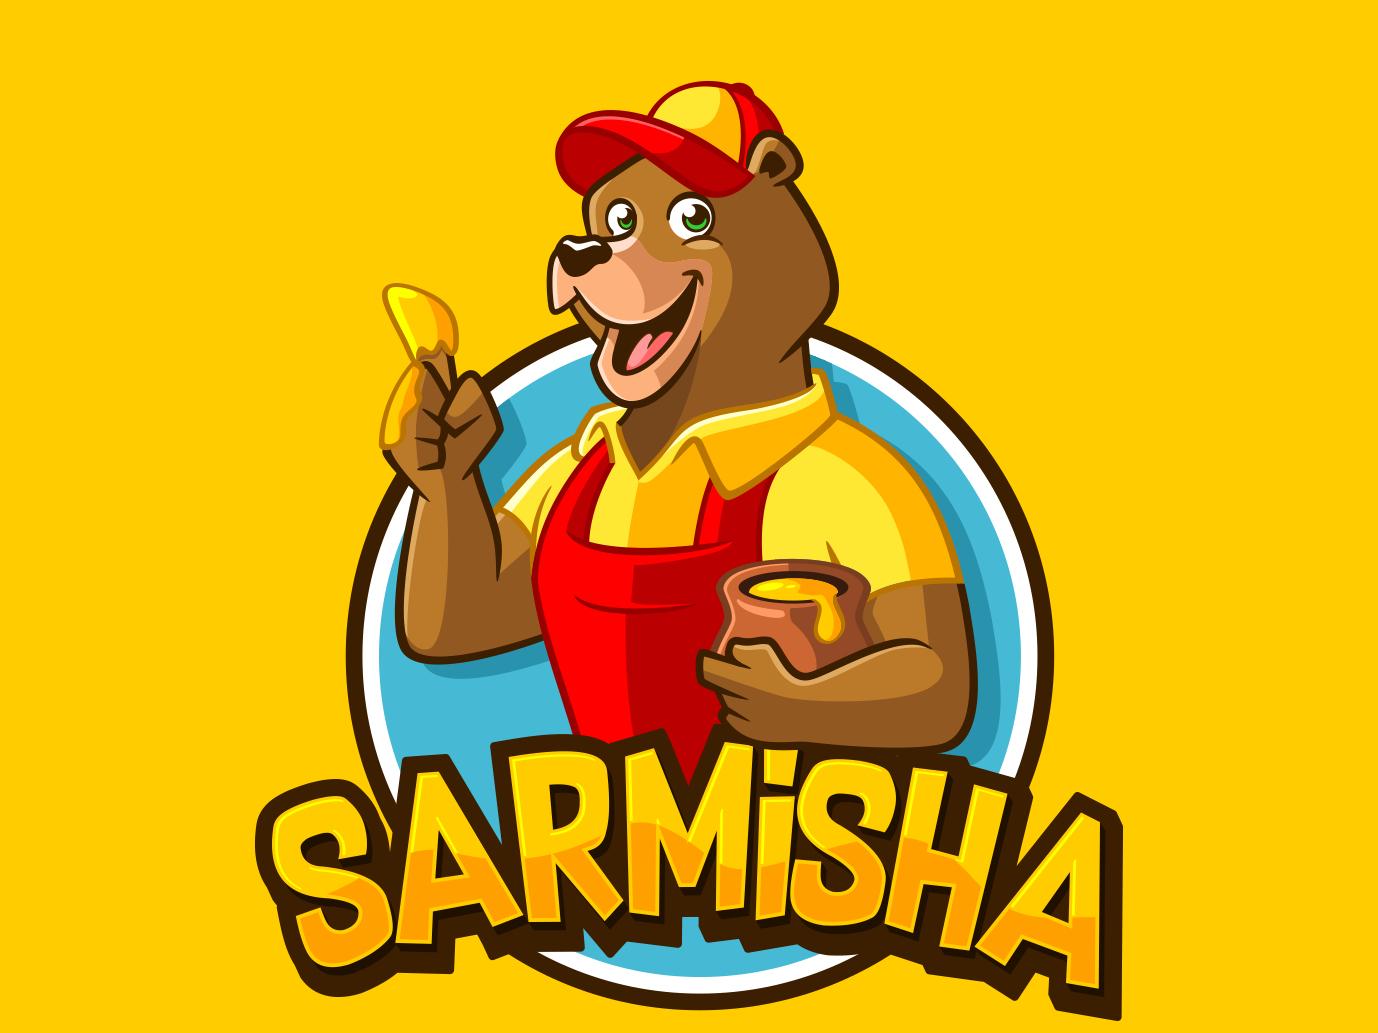 sarmisha mascot design typography pictoftheday clothing brand mascot design mascot character logodesign vector mascot logo illustration design characterdesign branding